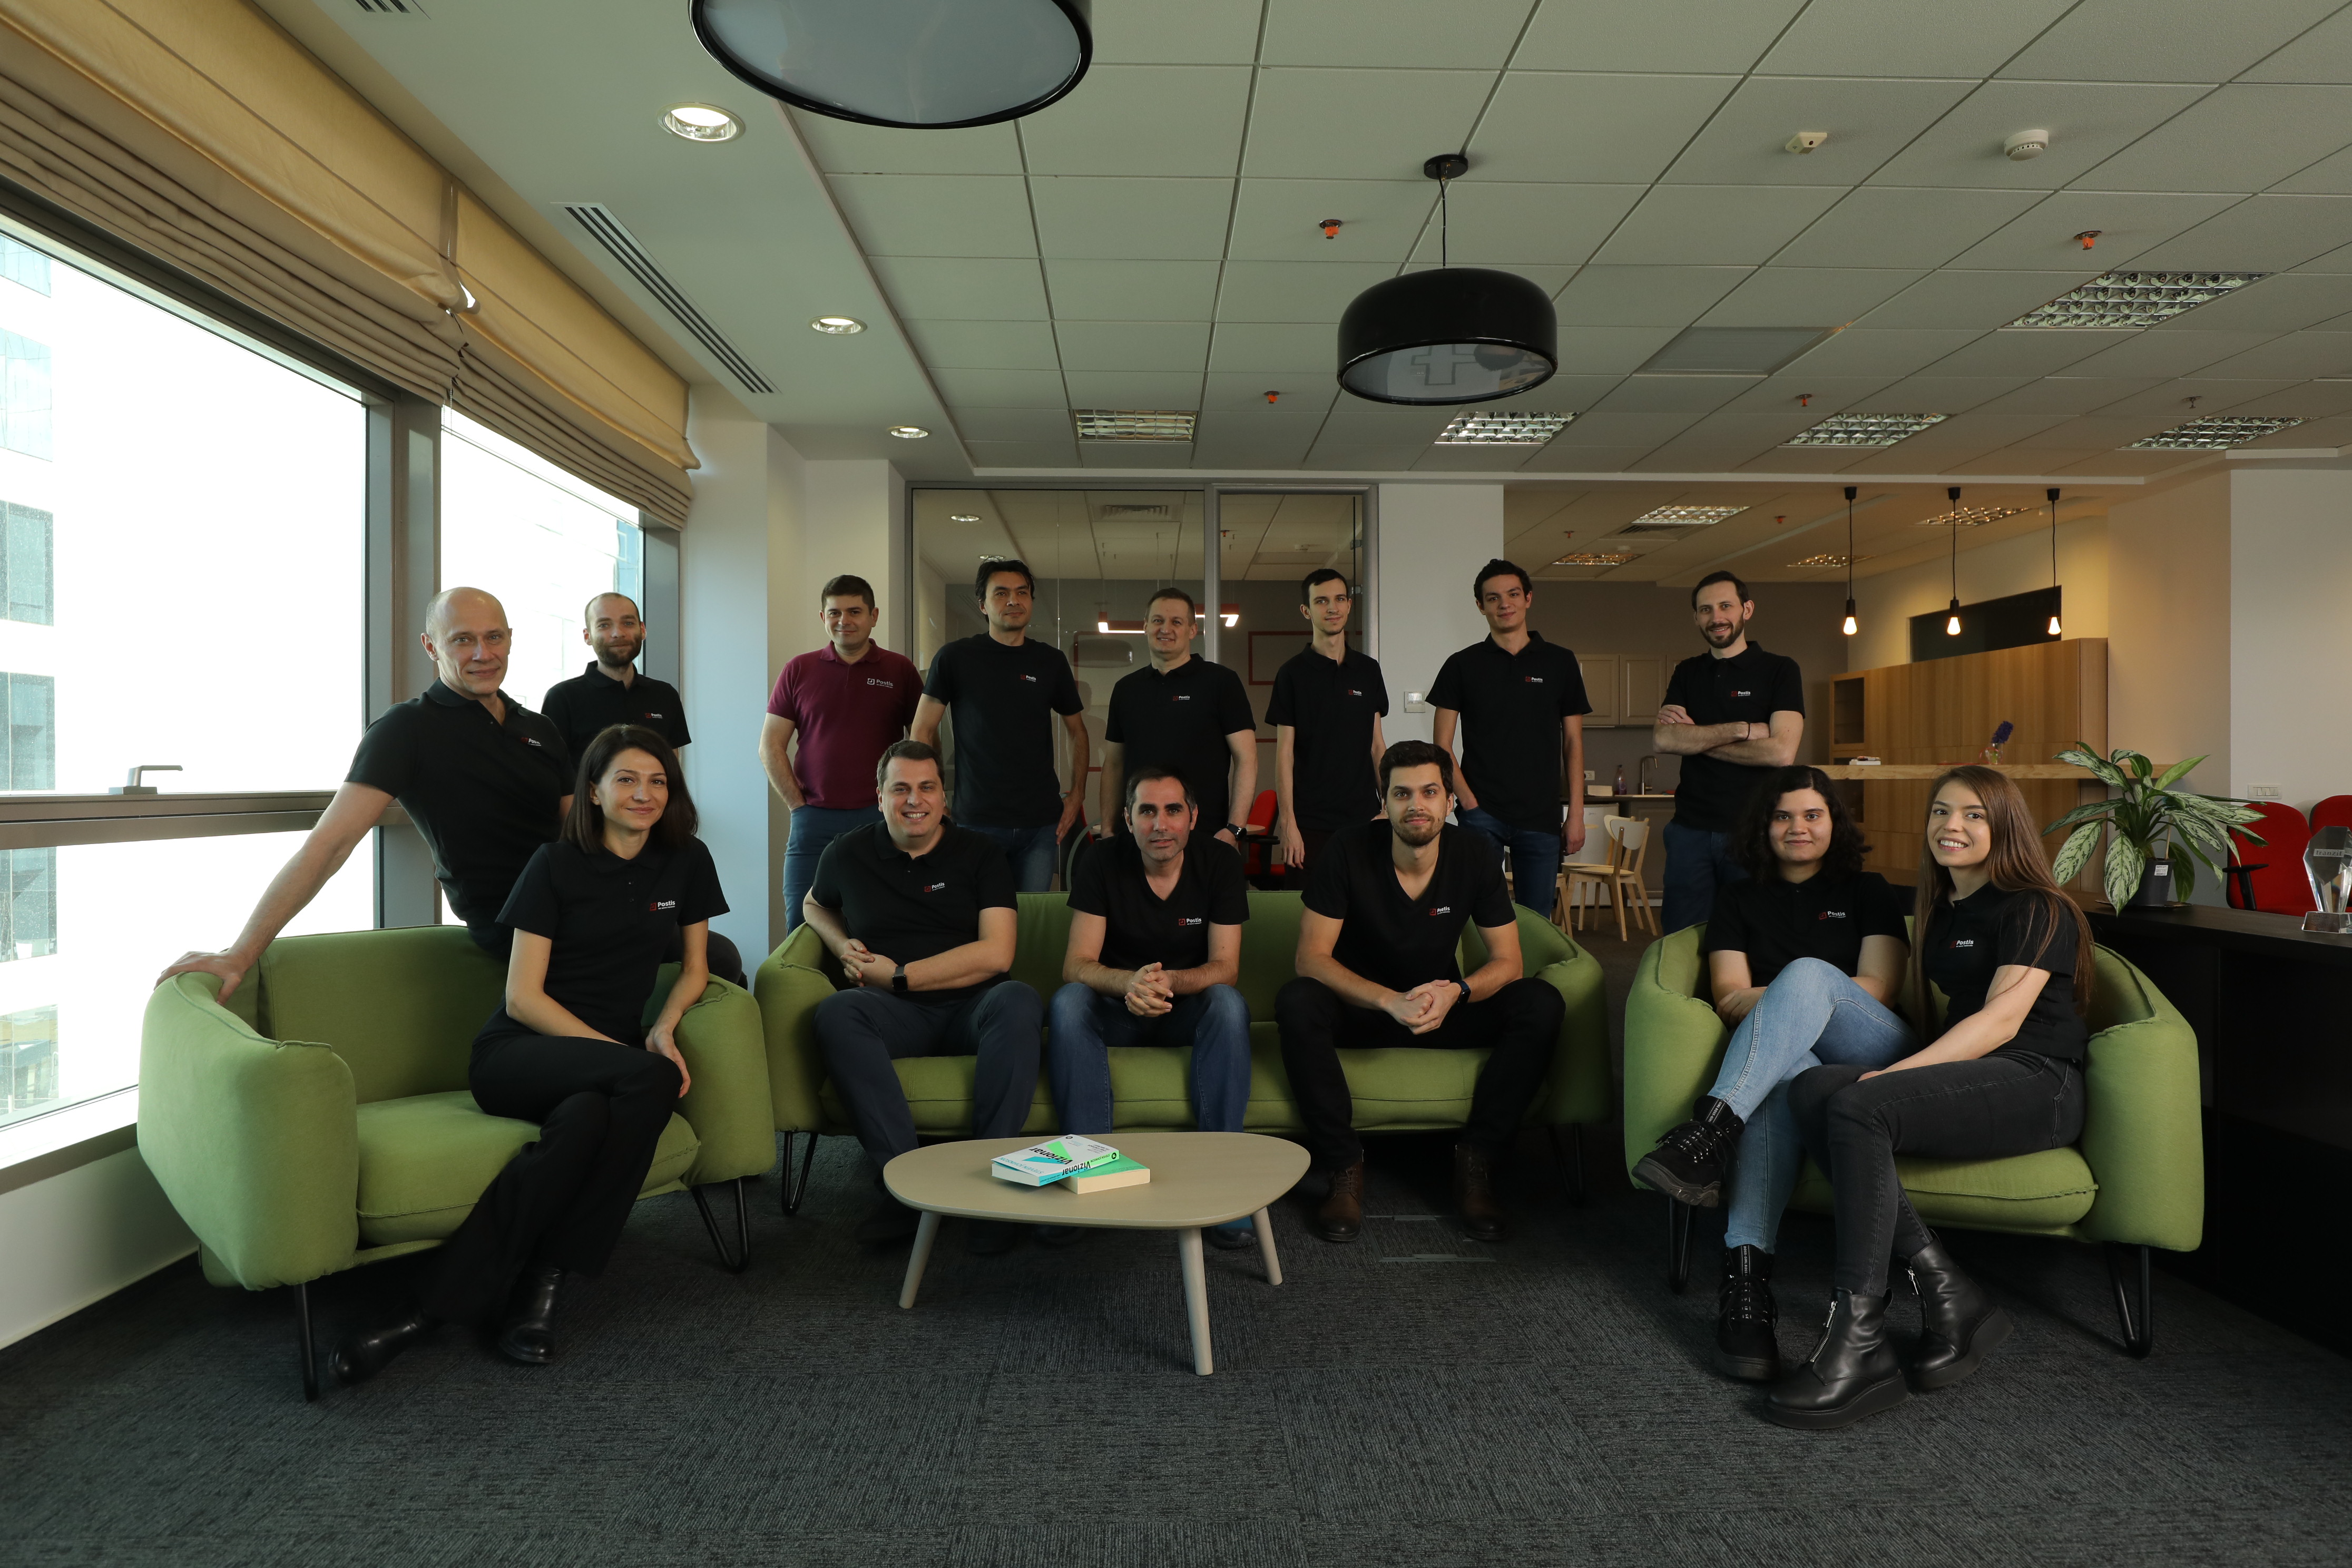 Postis team